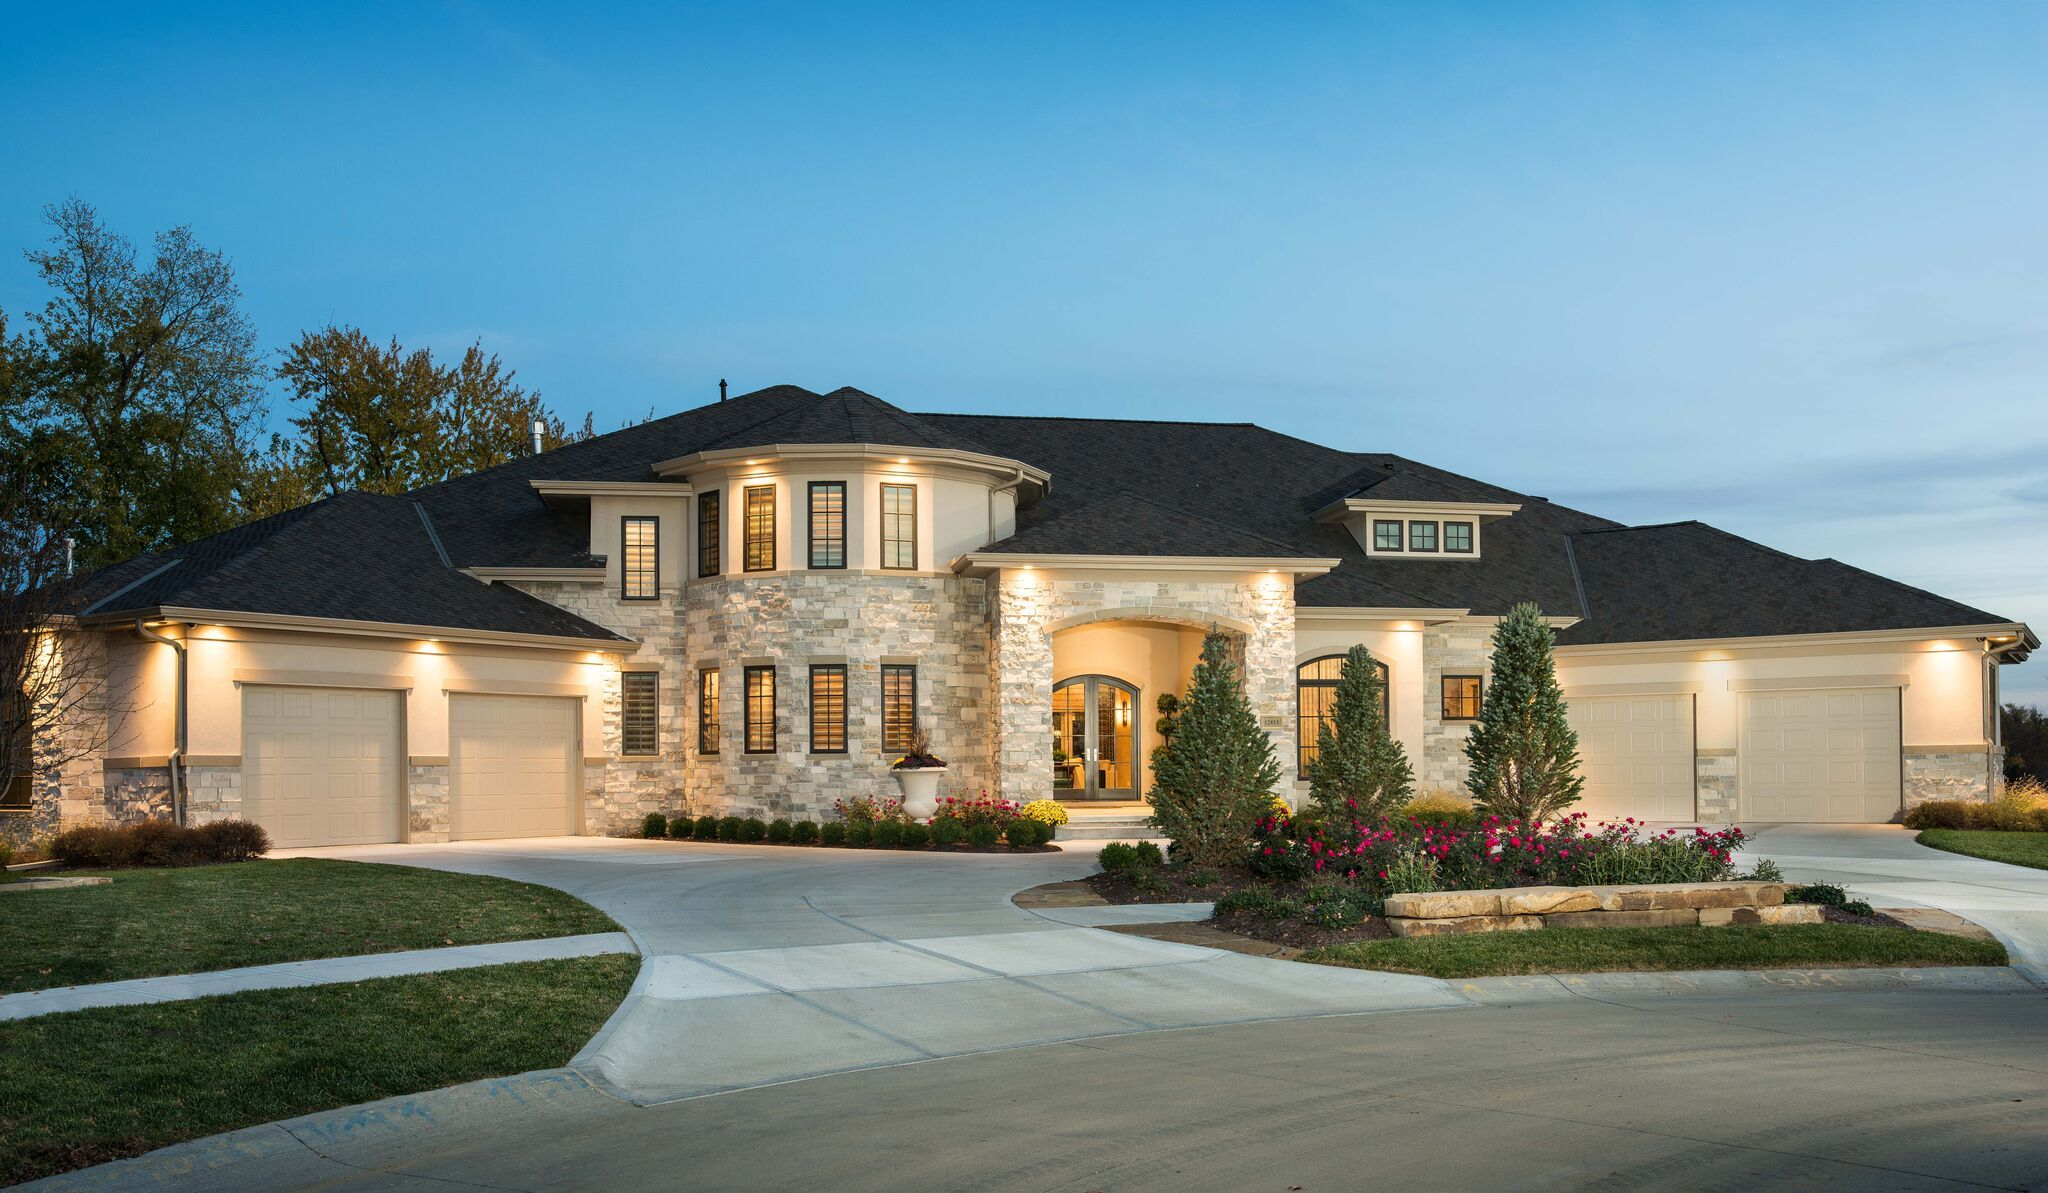 Custom home designed by advanced houseplans built bloomfield homes also rh pinterest